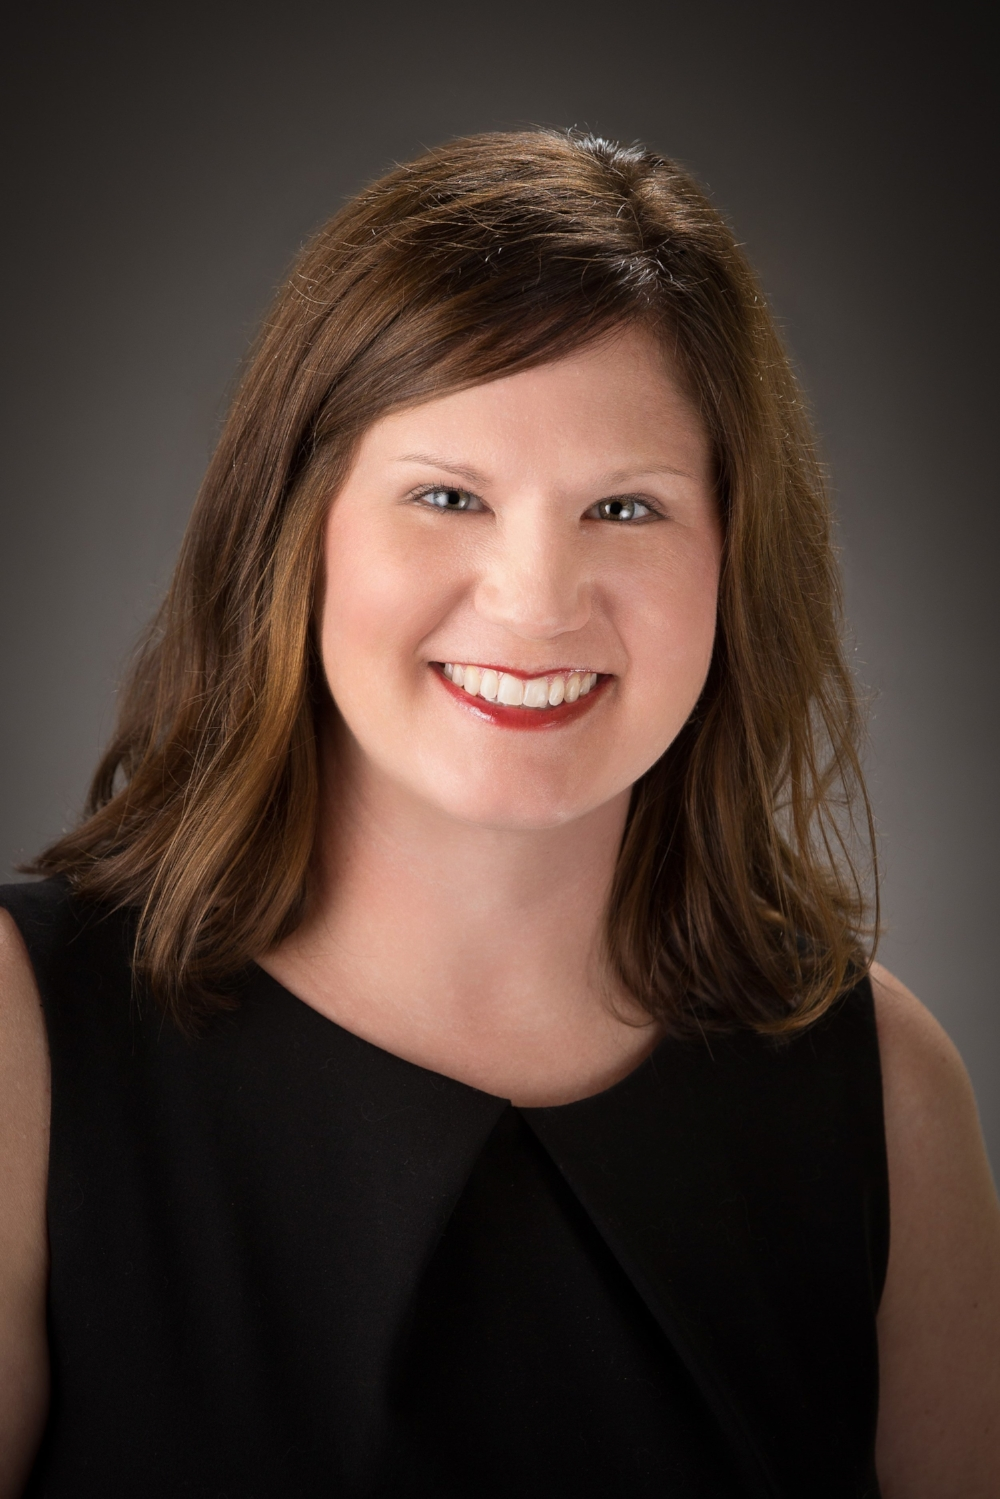 Lisa Groon, Founder Ovo Birth Center